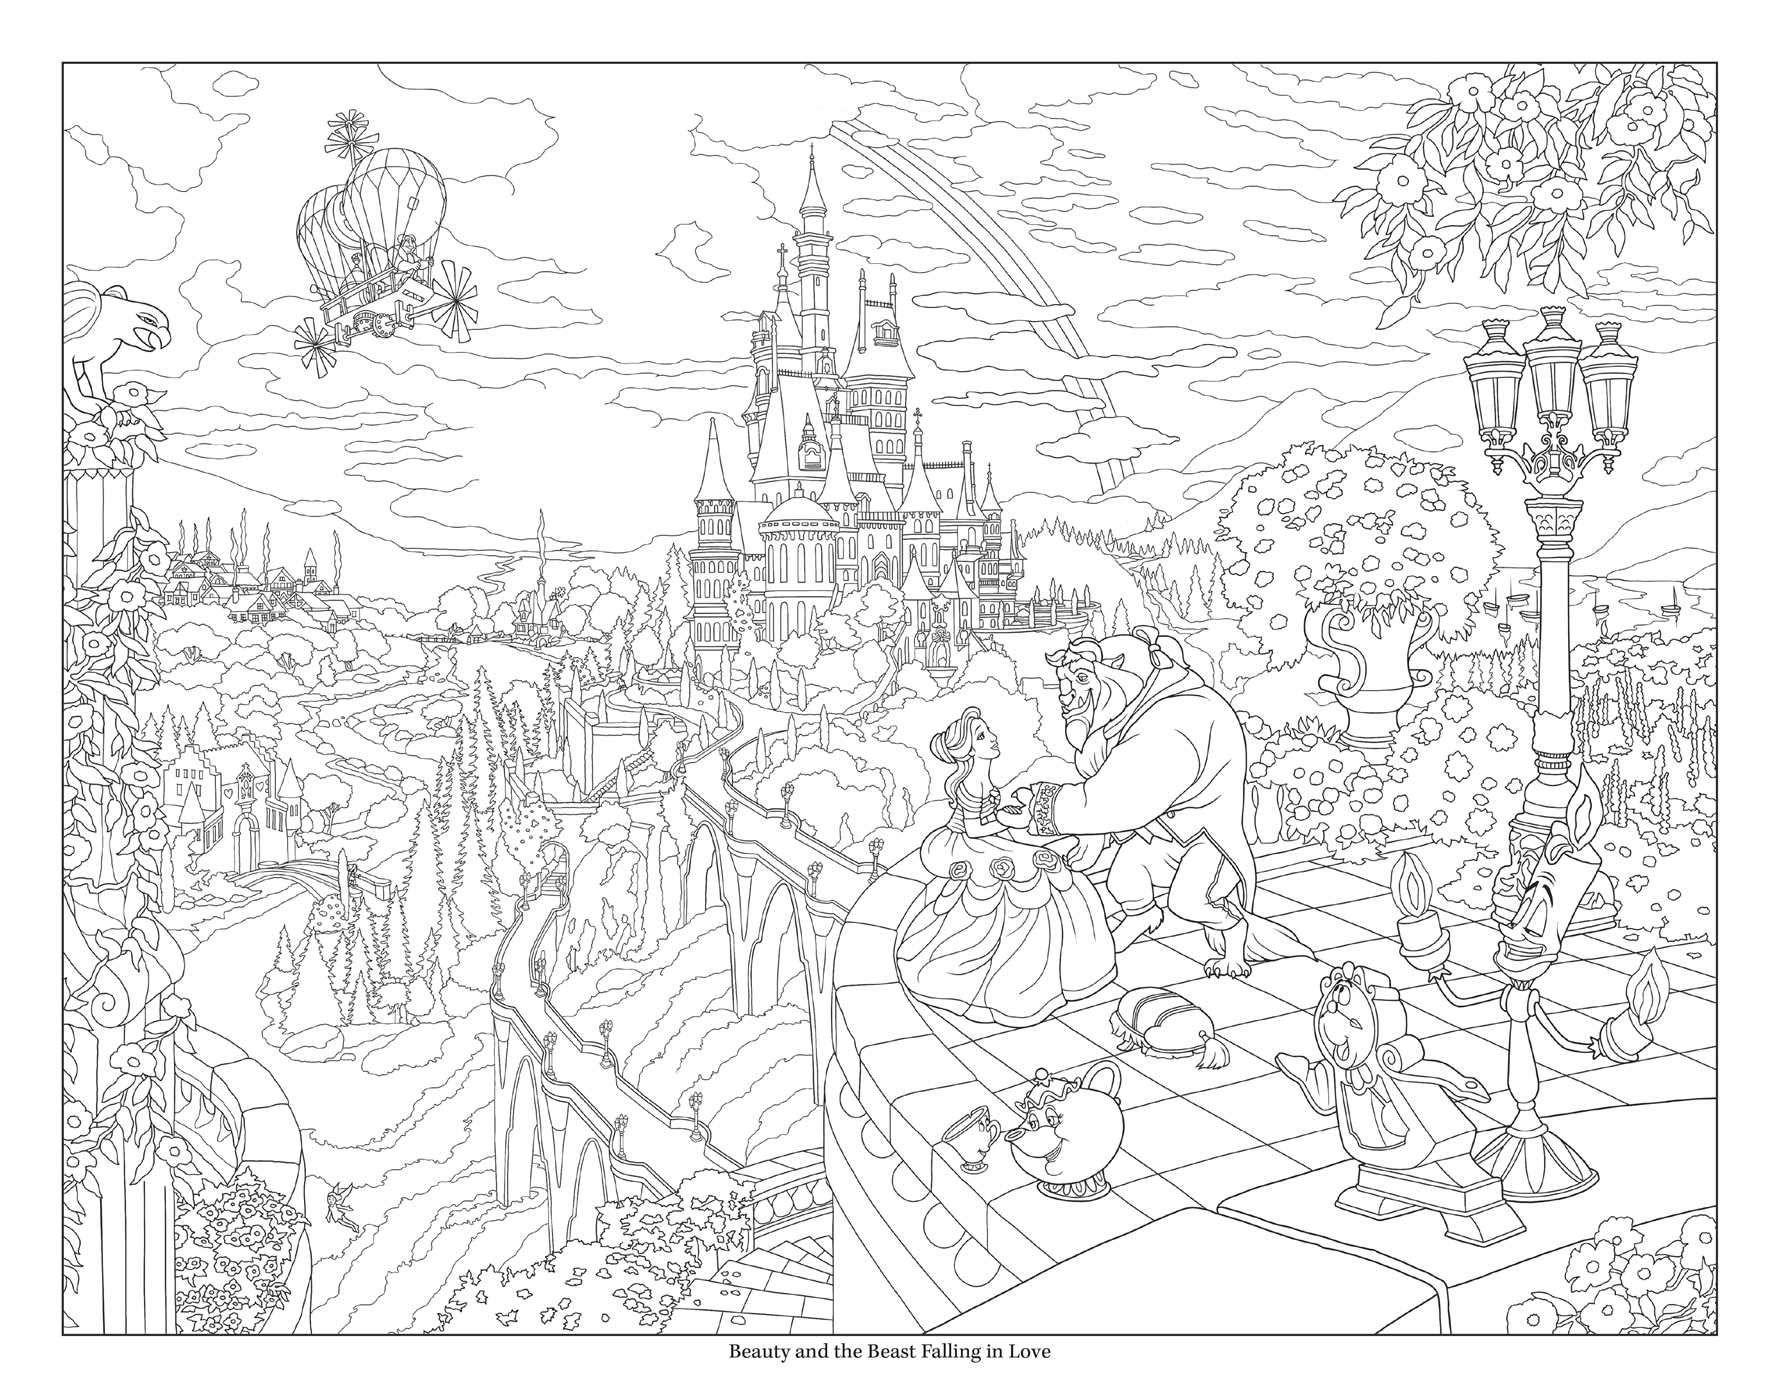 Disney Dreams Collection Thomas Kinkade Studios Disney Princess Coloring Book Paperback Princess Coloring Pages Disney Princess Colors Disney Coloring Pages